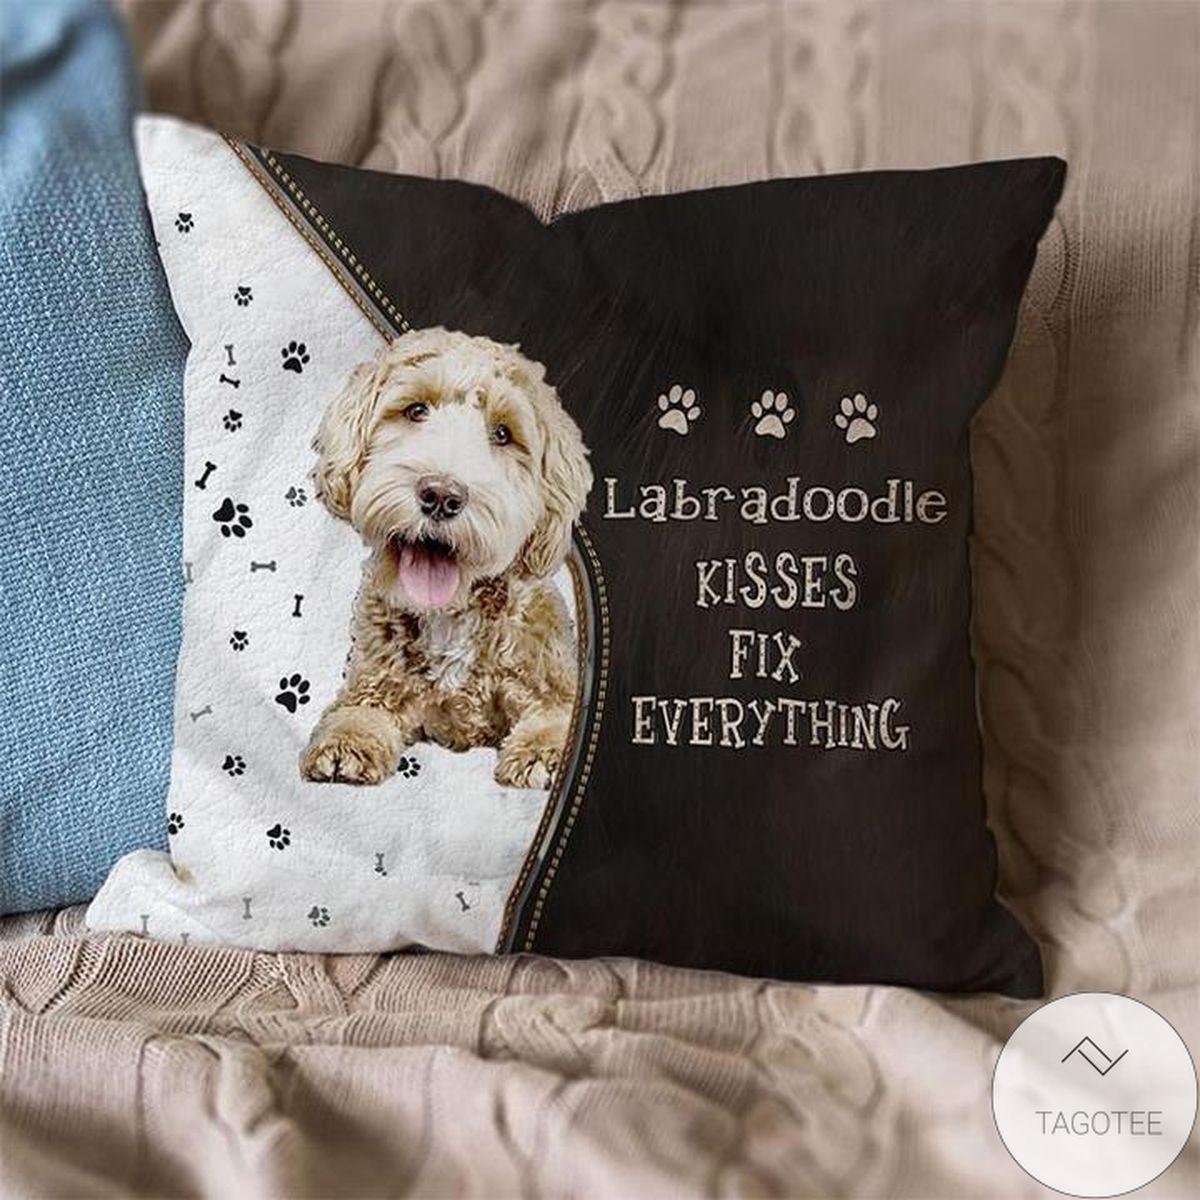 Labradoodle Kisses Fix Everything Pillowcase